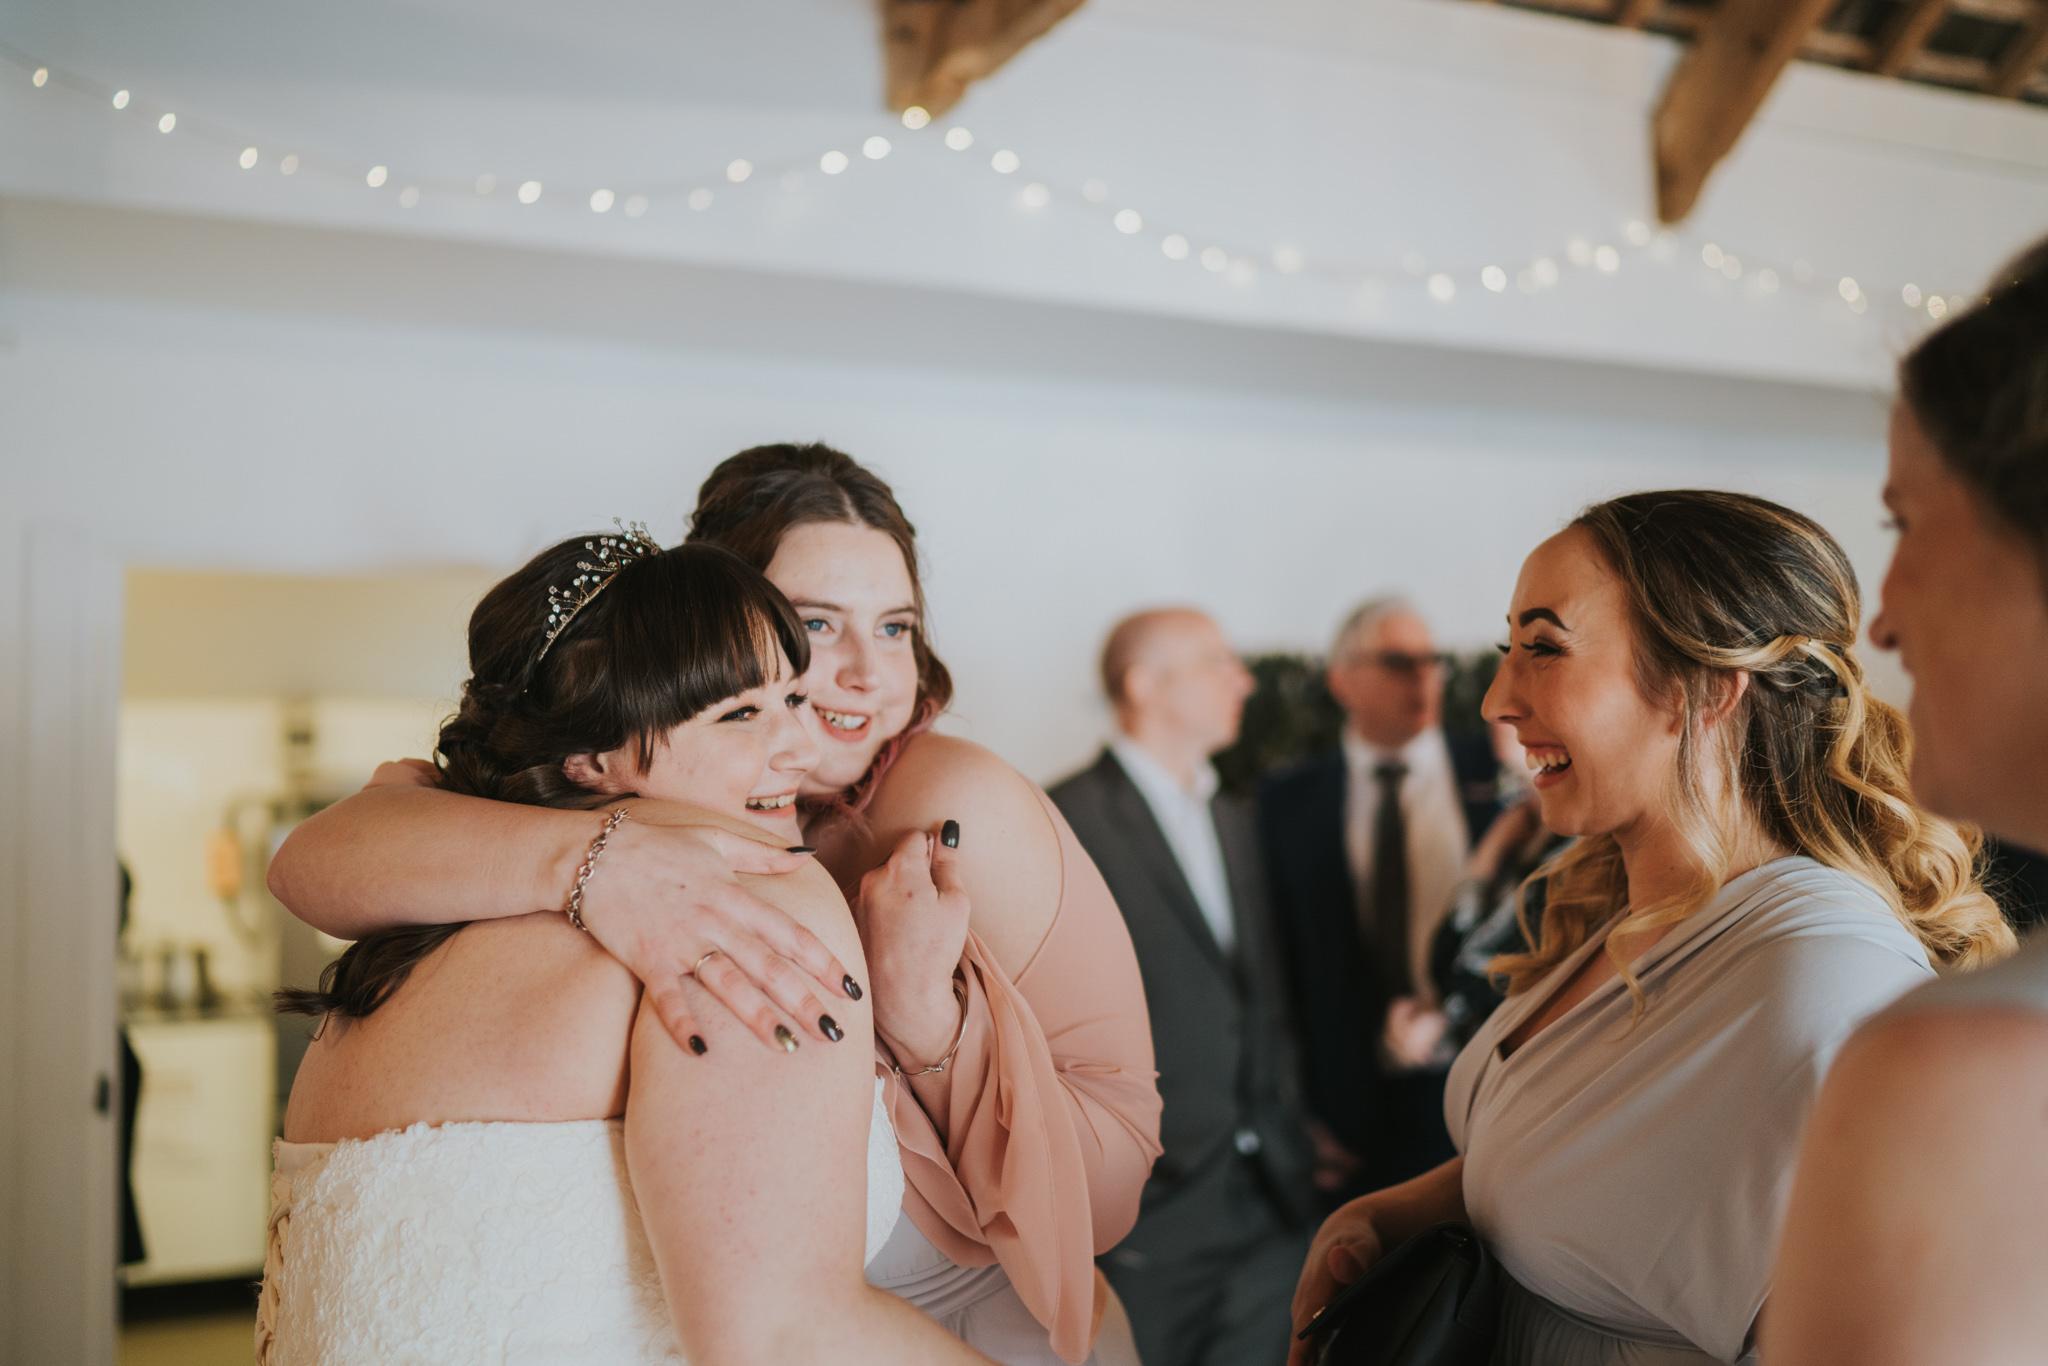 grace-sam-old-barn-clovelly-devon-wedding-photographer-grace-elizabeth-essex-suffolk-norfolk-wedding-photographer (73 of 132).jpg